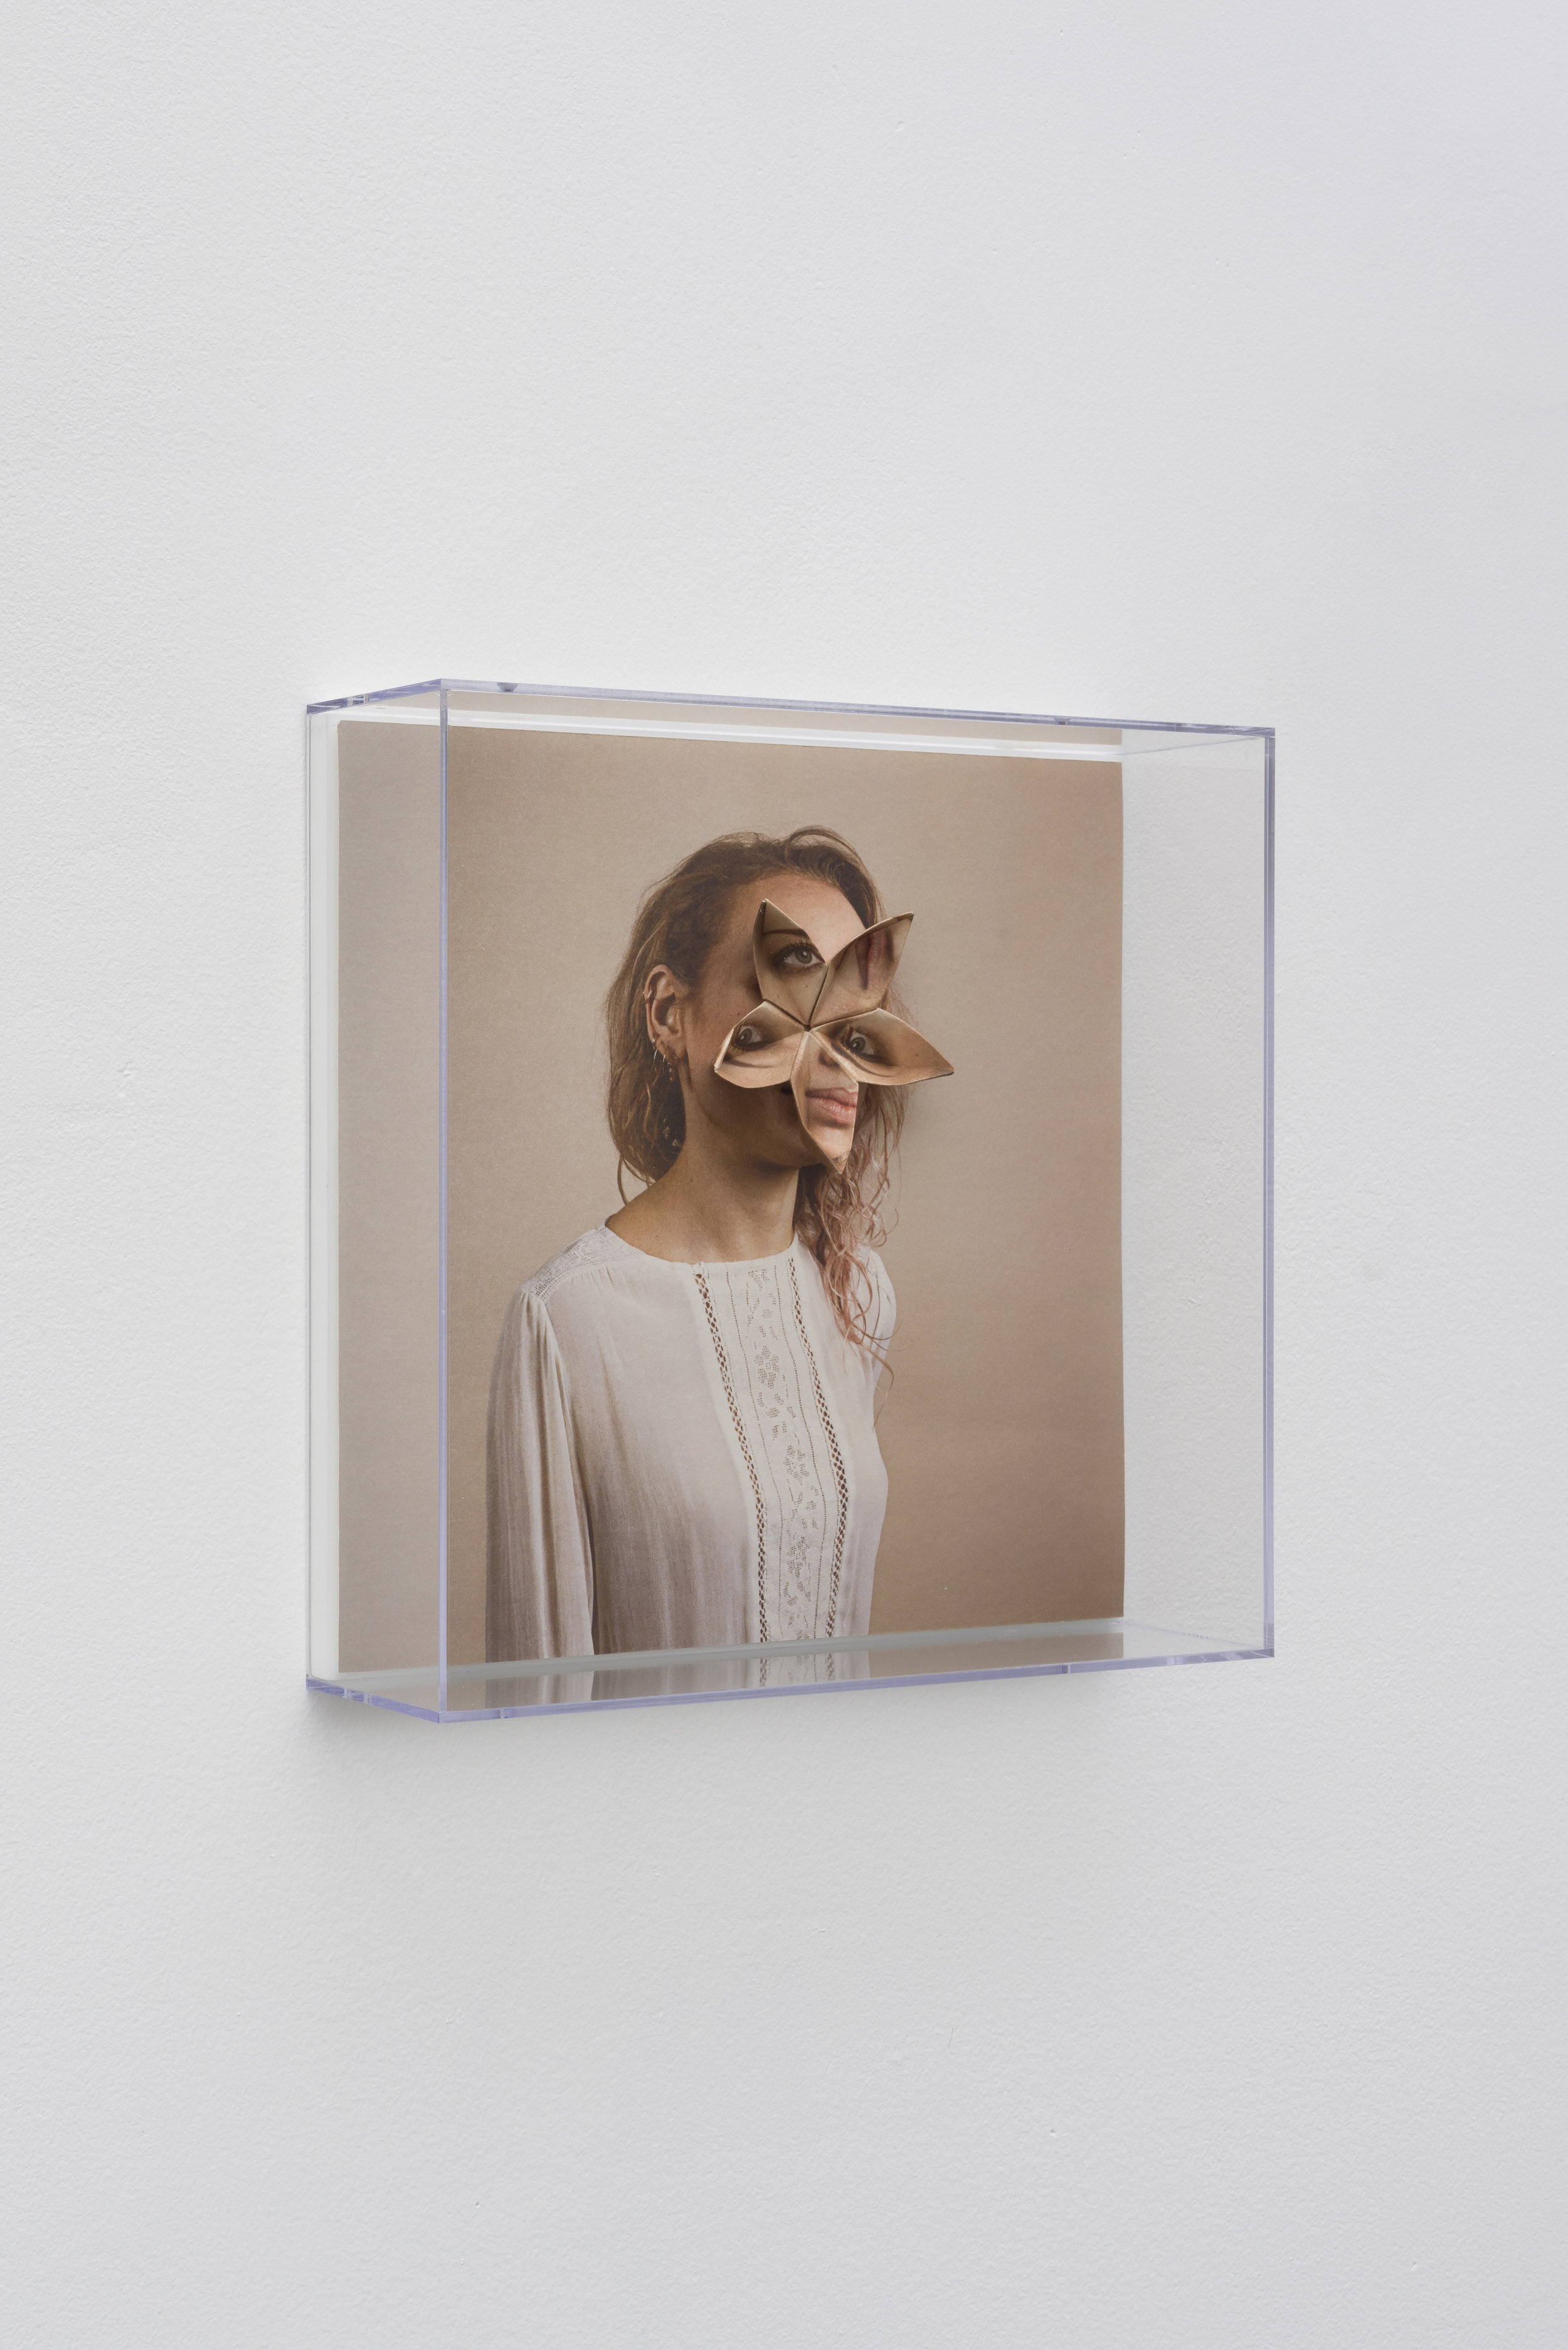 Alma Haser,  Patient No. 40 HD (Hannah) , 2017  Digital pigment print with folded digital pigment print sculpture, plexiglass box, 30 x 30 x 10 cm (approx. 12 x 12 x 4 in), edition of 5   Inquire